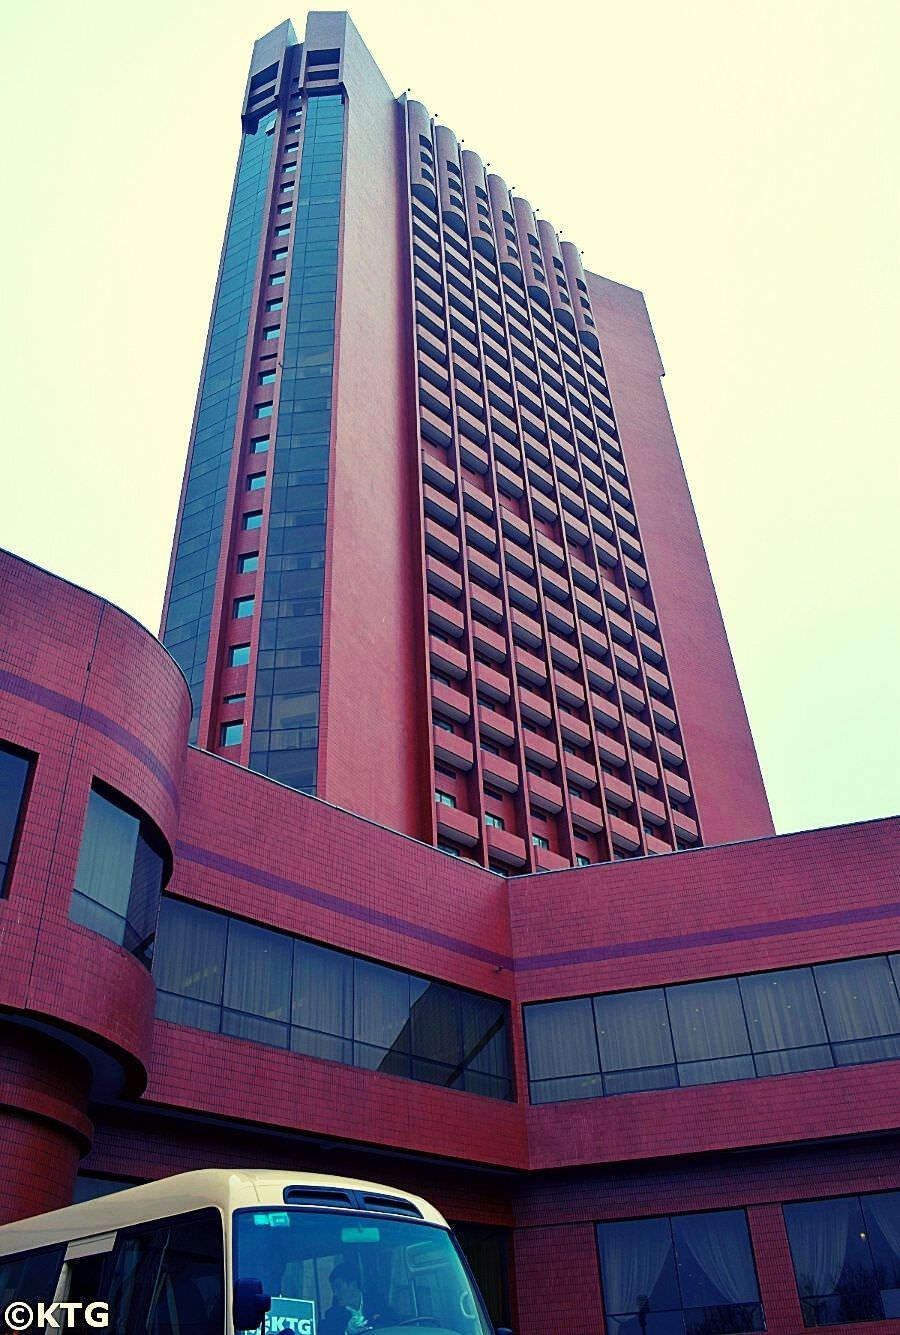 Sosan Hotel in Pyongyang capital of North Korea